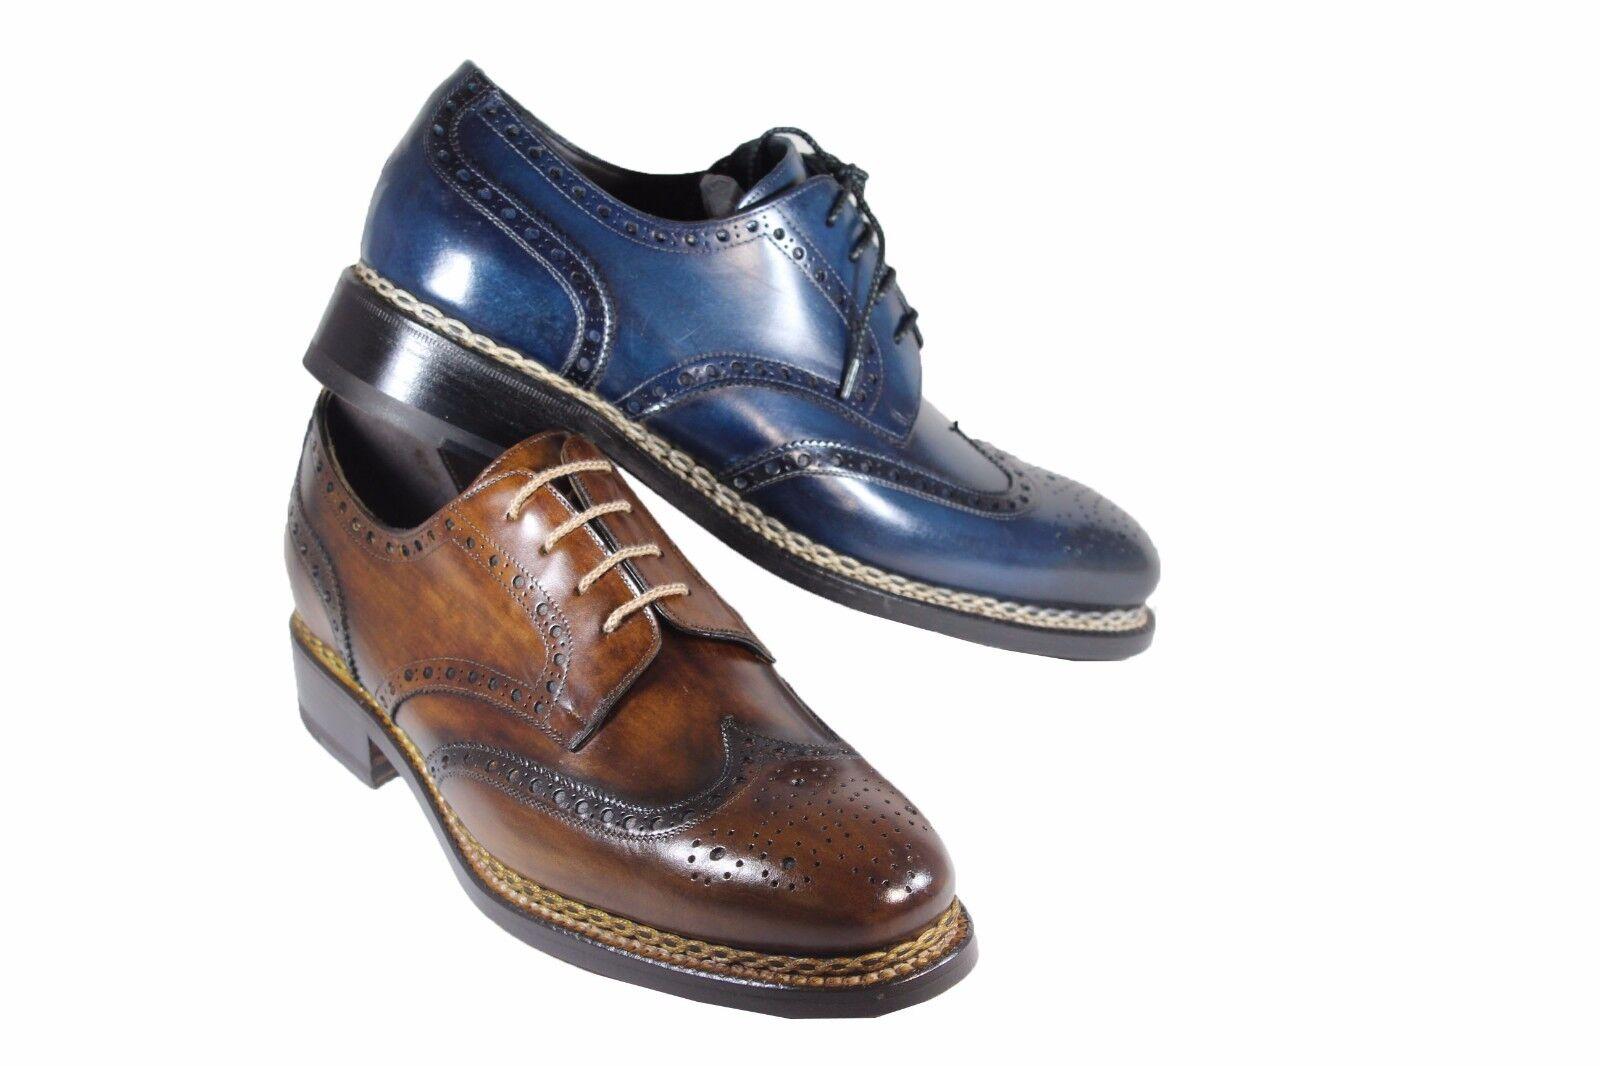 HARRIS leather derby brogue stringate eleganti stile inglese cucitura norvegese